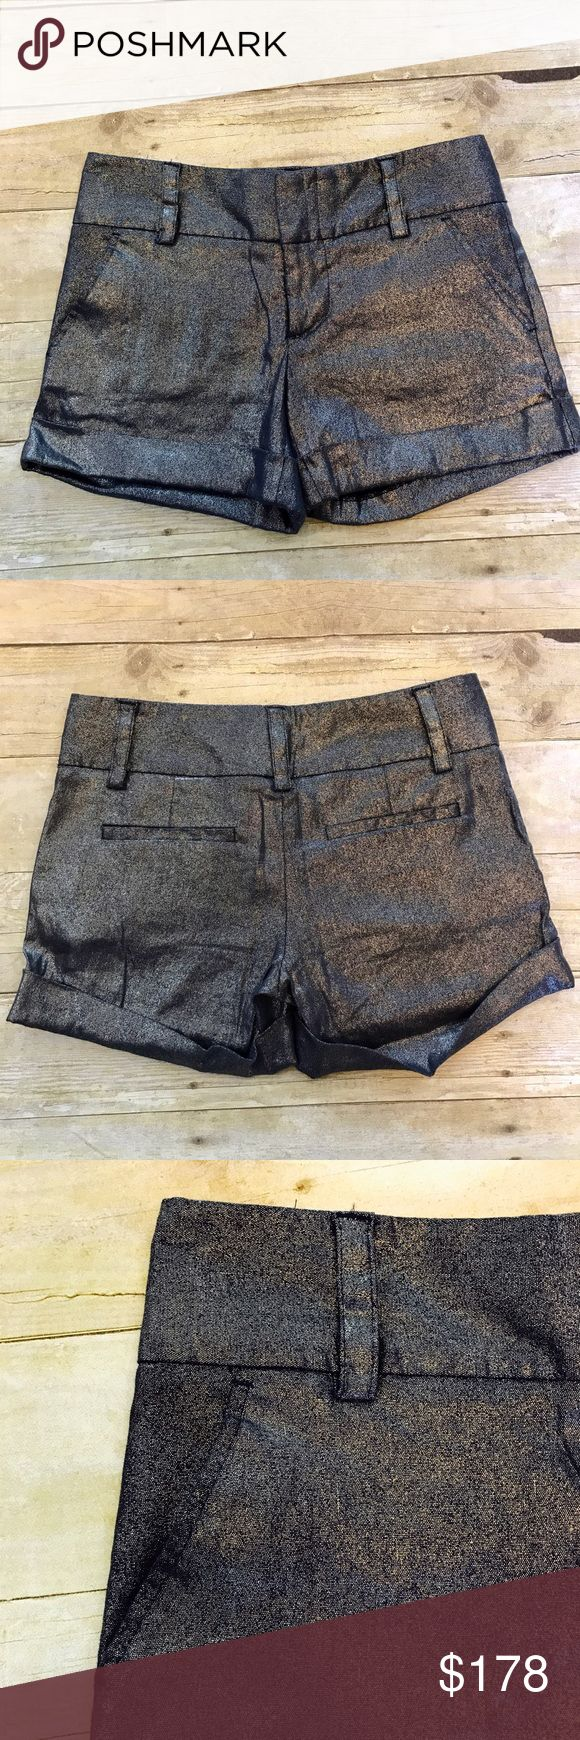 😍Alice + Olivia fabulous cady metallic shorts Alice + Olivia cady cuff metallic linen shorts. Hook/bar close. Belt loops, 2 front pockets 2 back welt pockets. Alice + Olivia Shorts